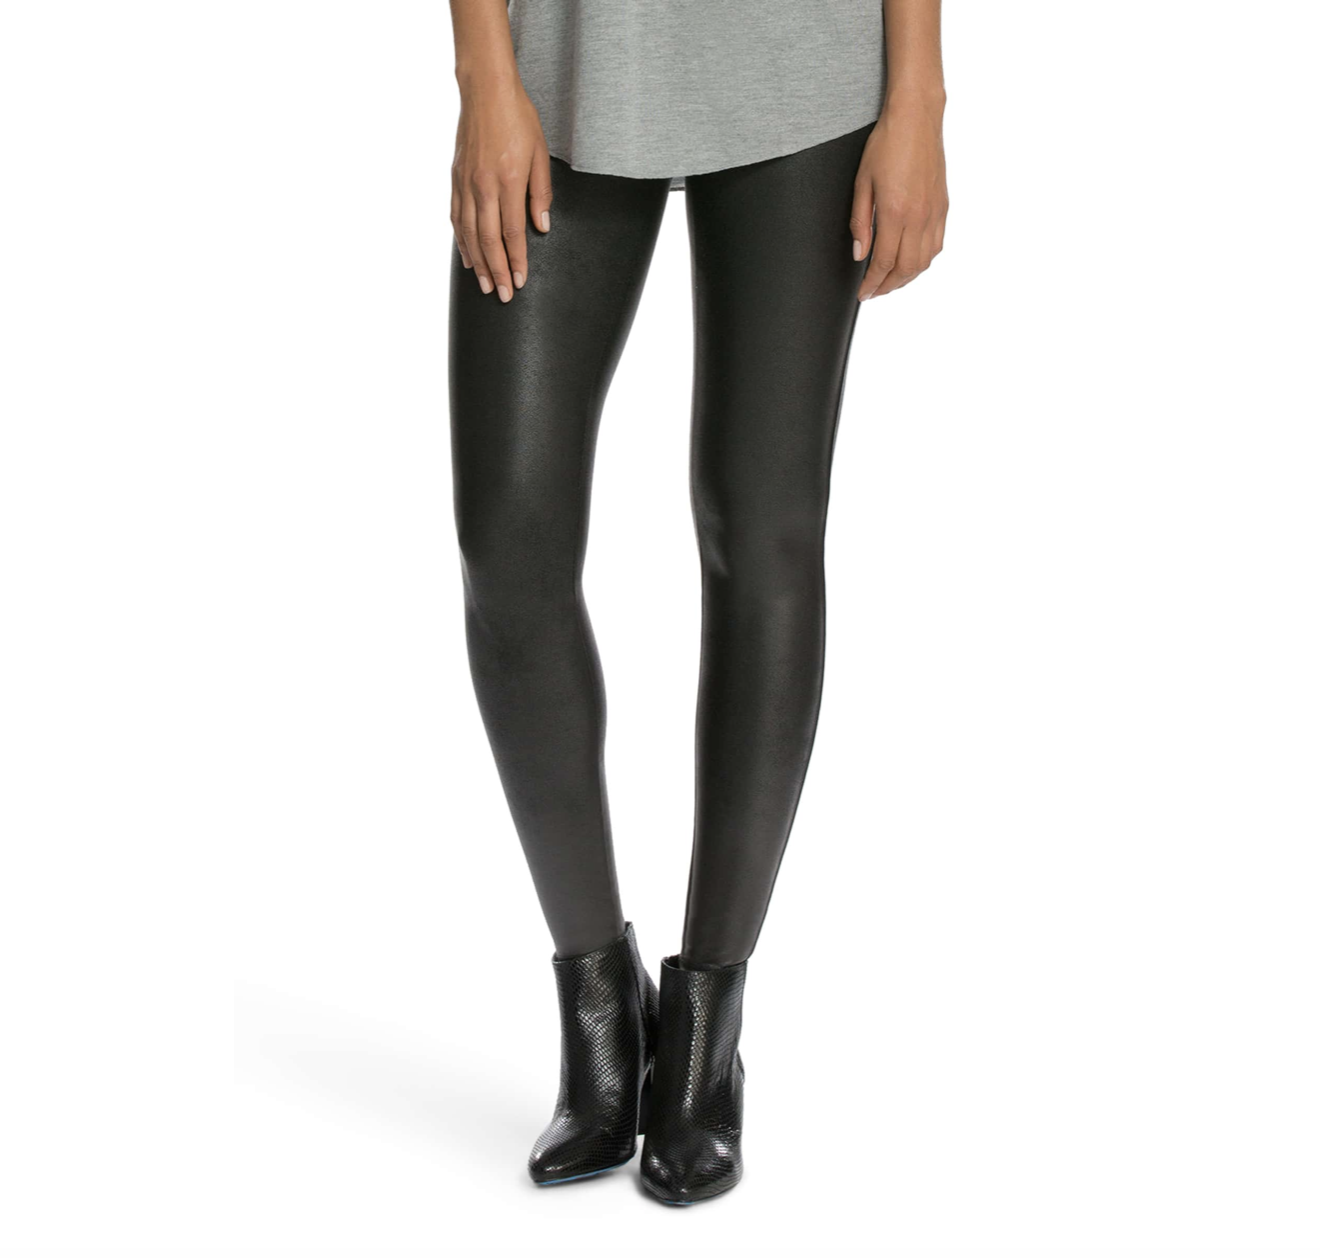 SPANX Leggings | Nordstrom Sale 2019 | A Demure Life Fashion Blog